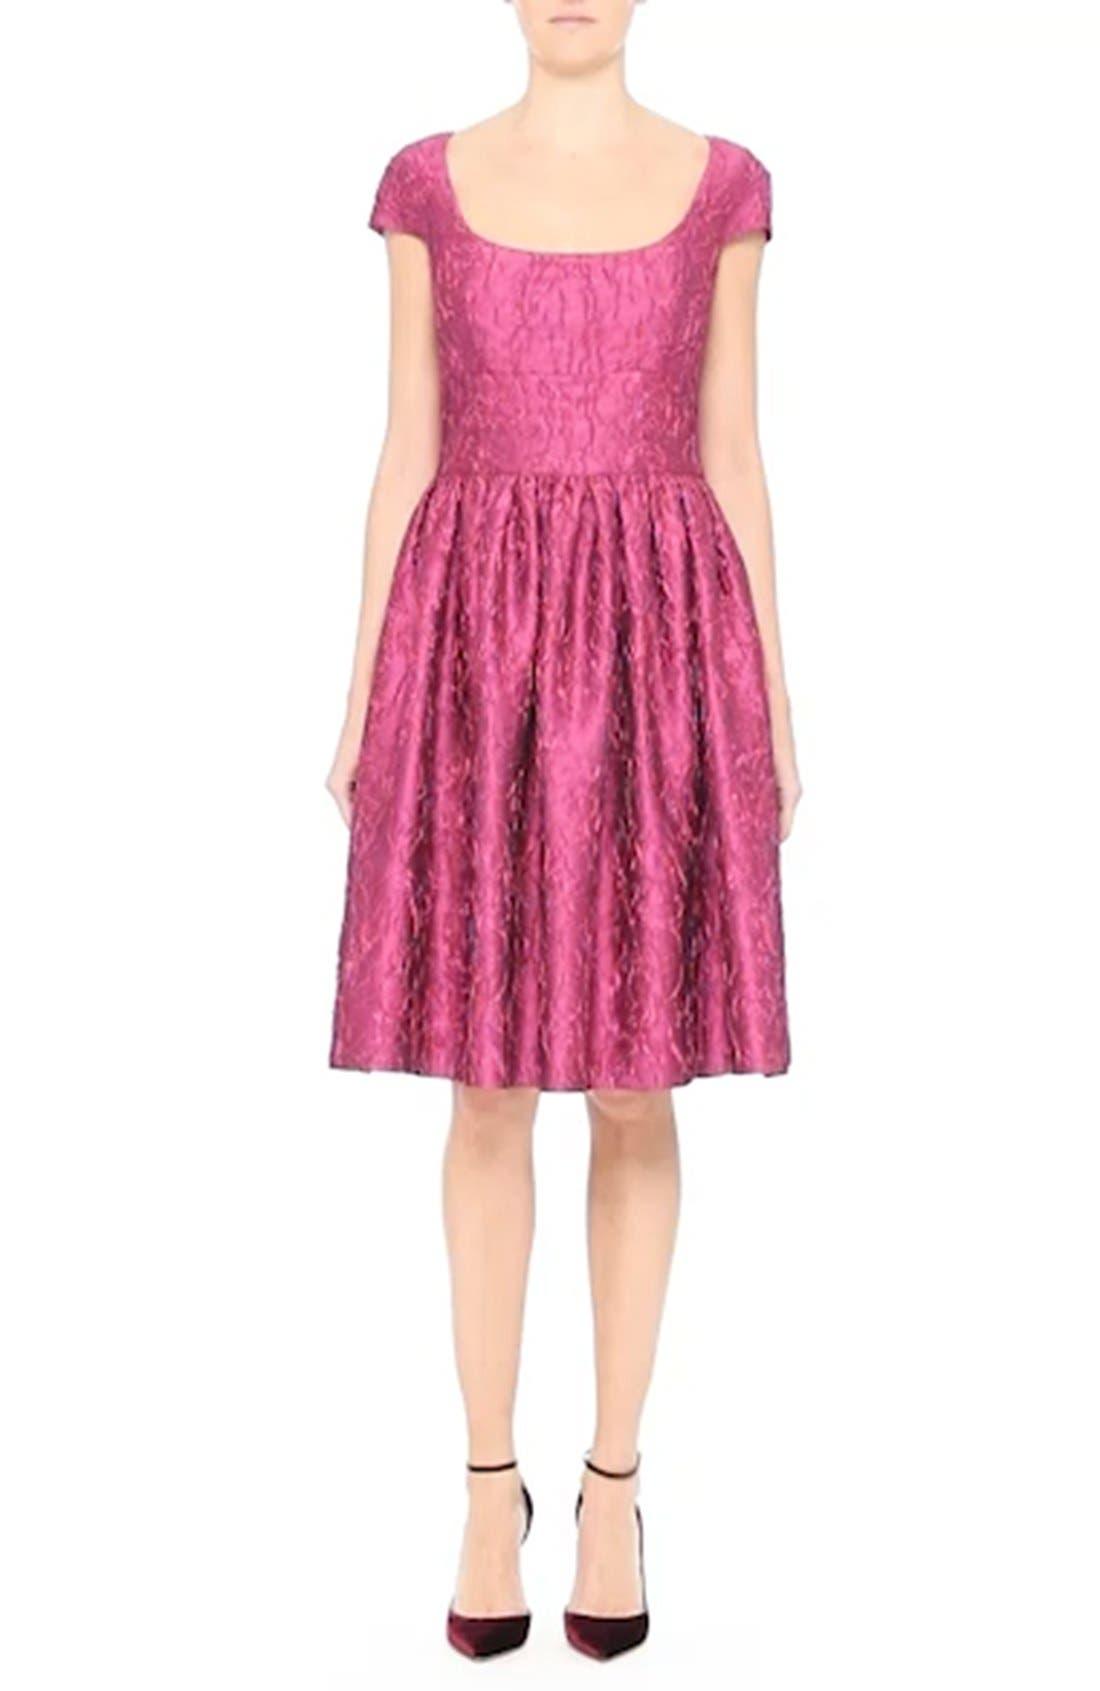 BADGLEY MISCHKA COUTURE., Badgley Mischka Couture Cap Sleeve Brocade Party Dress, Alternate thumbnail 7, color, 652